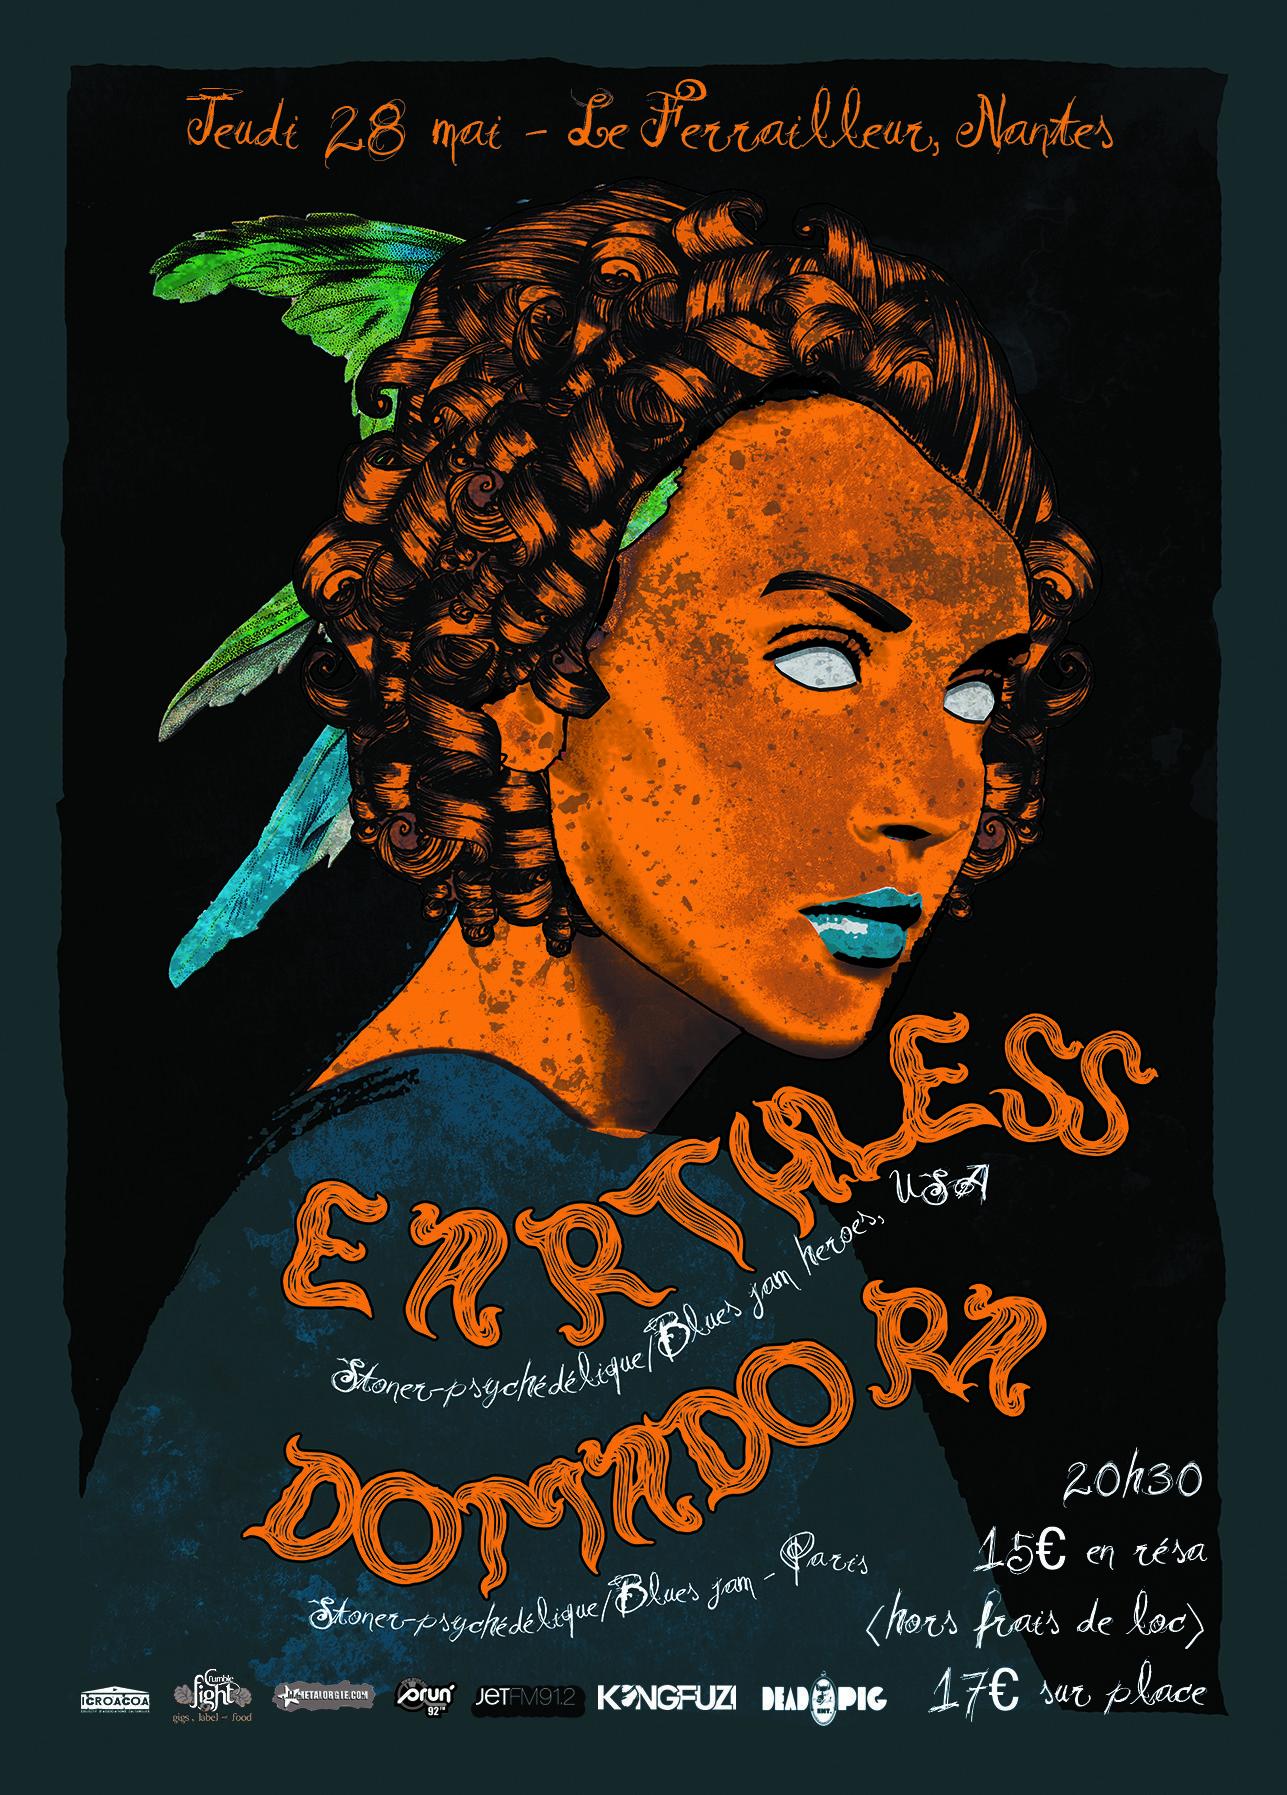 EARTHLESS en tournée !! INFOS : bit.ly/1FAHHbo